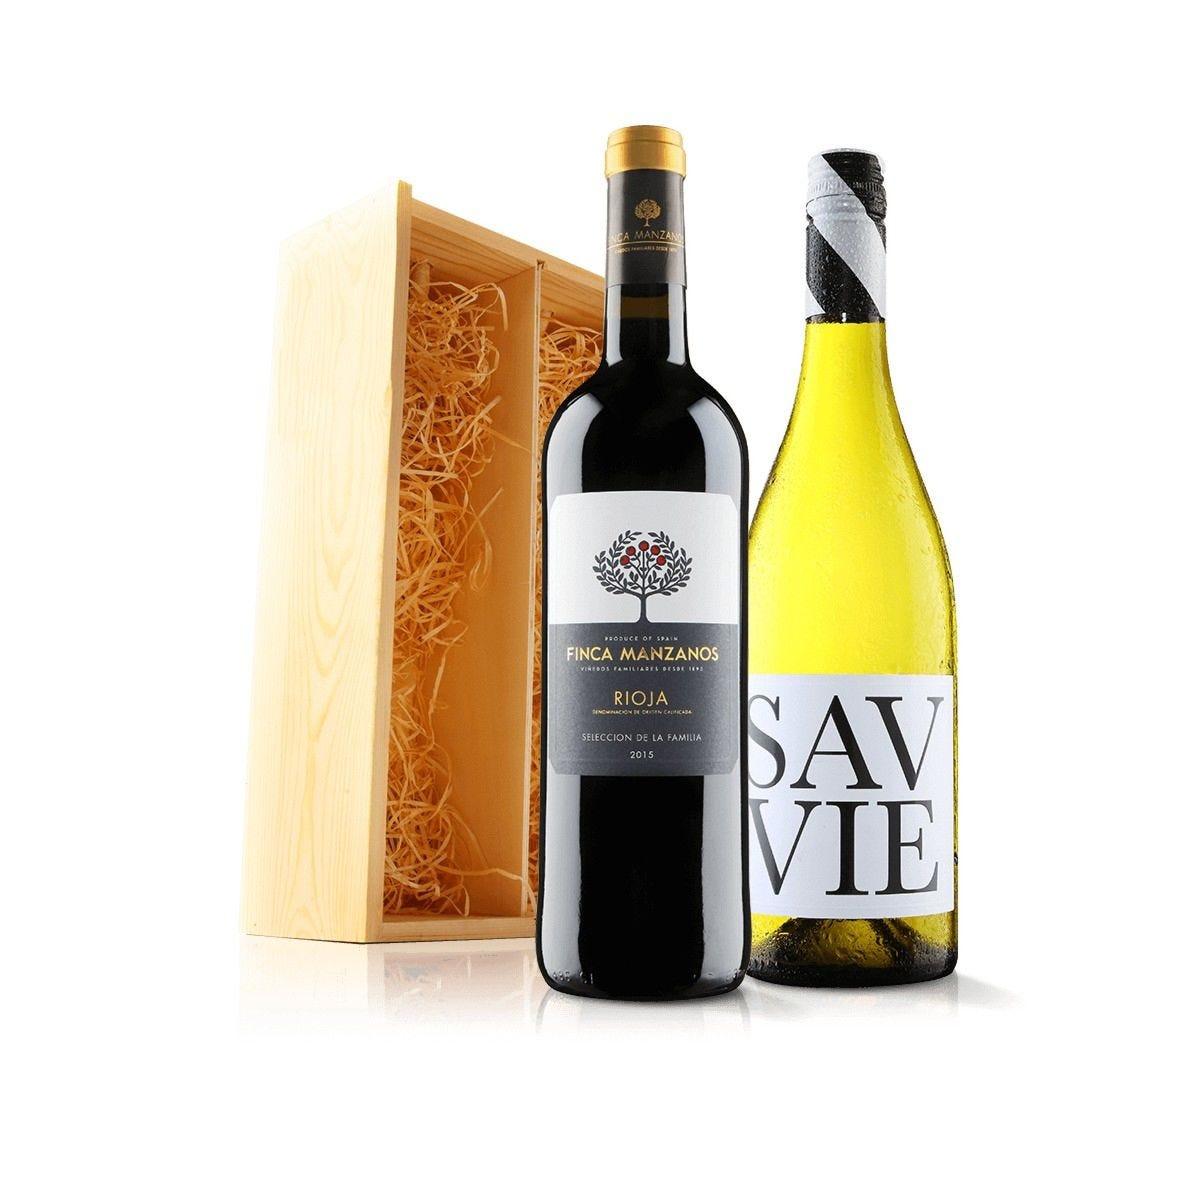 Virgin Wines Luxury Mixed Duo in Wooden Gift Box